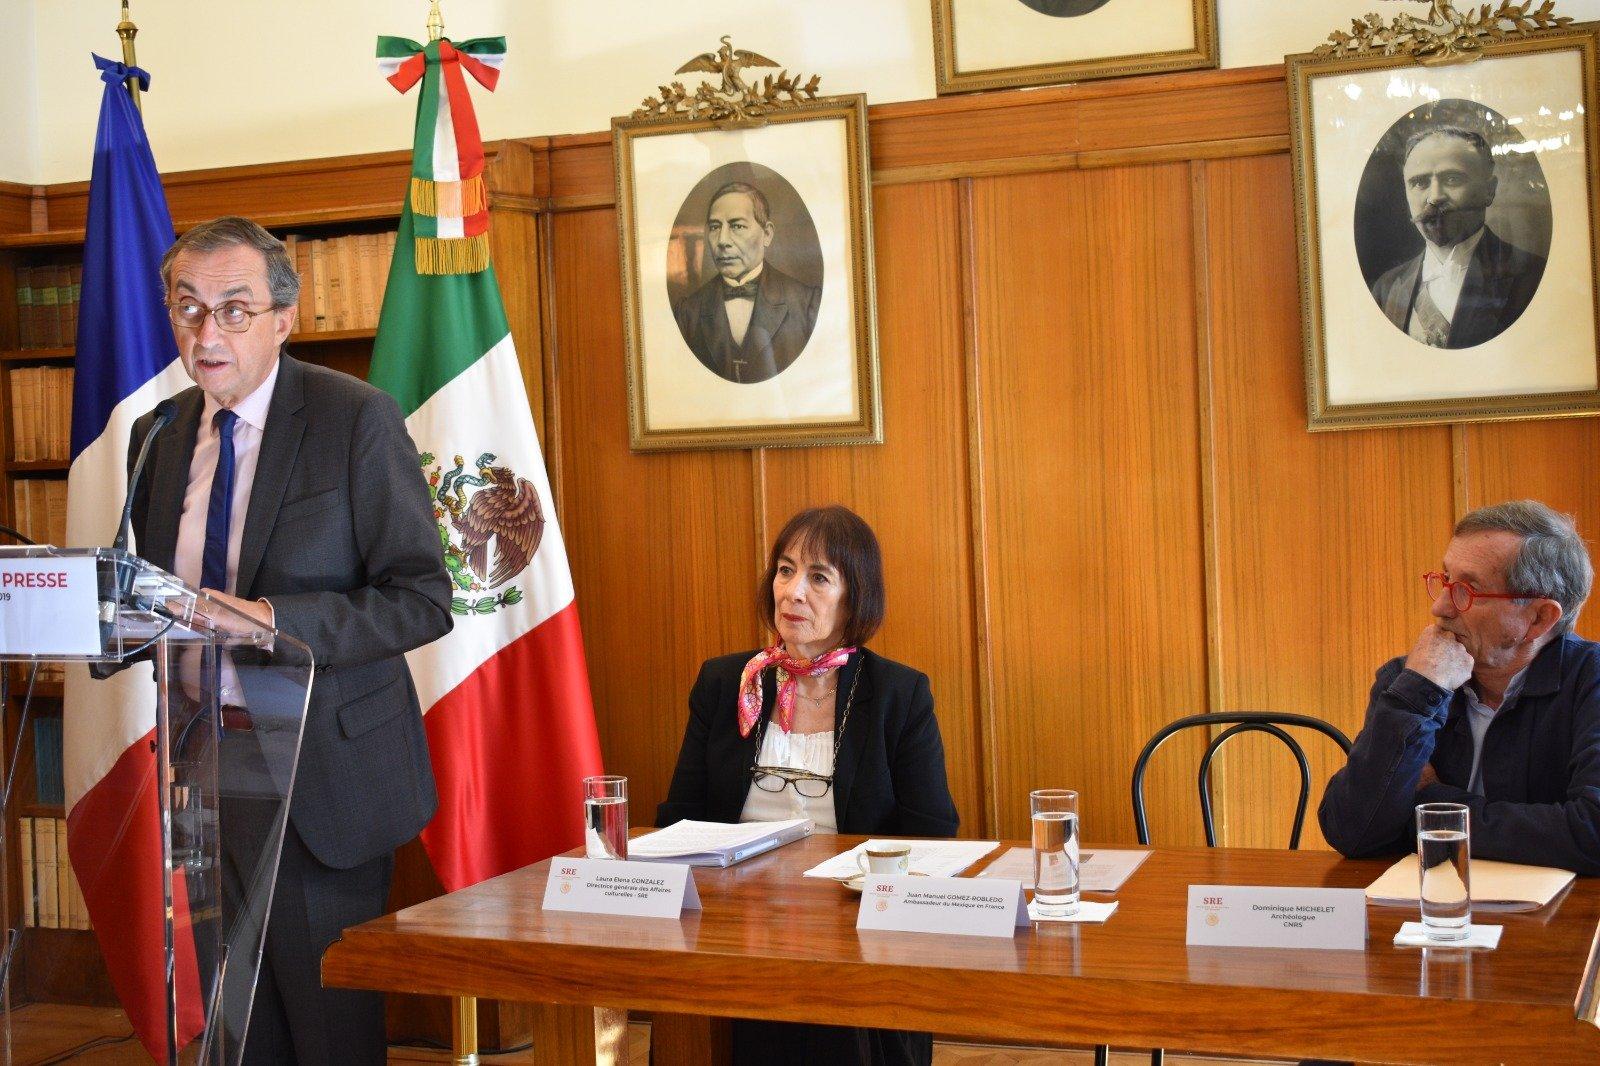 México solicita a Francia detener subasta de piezas prehispánicas